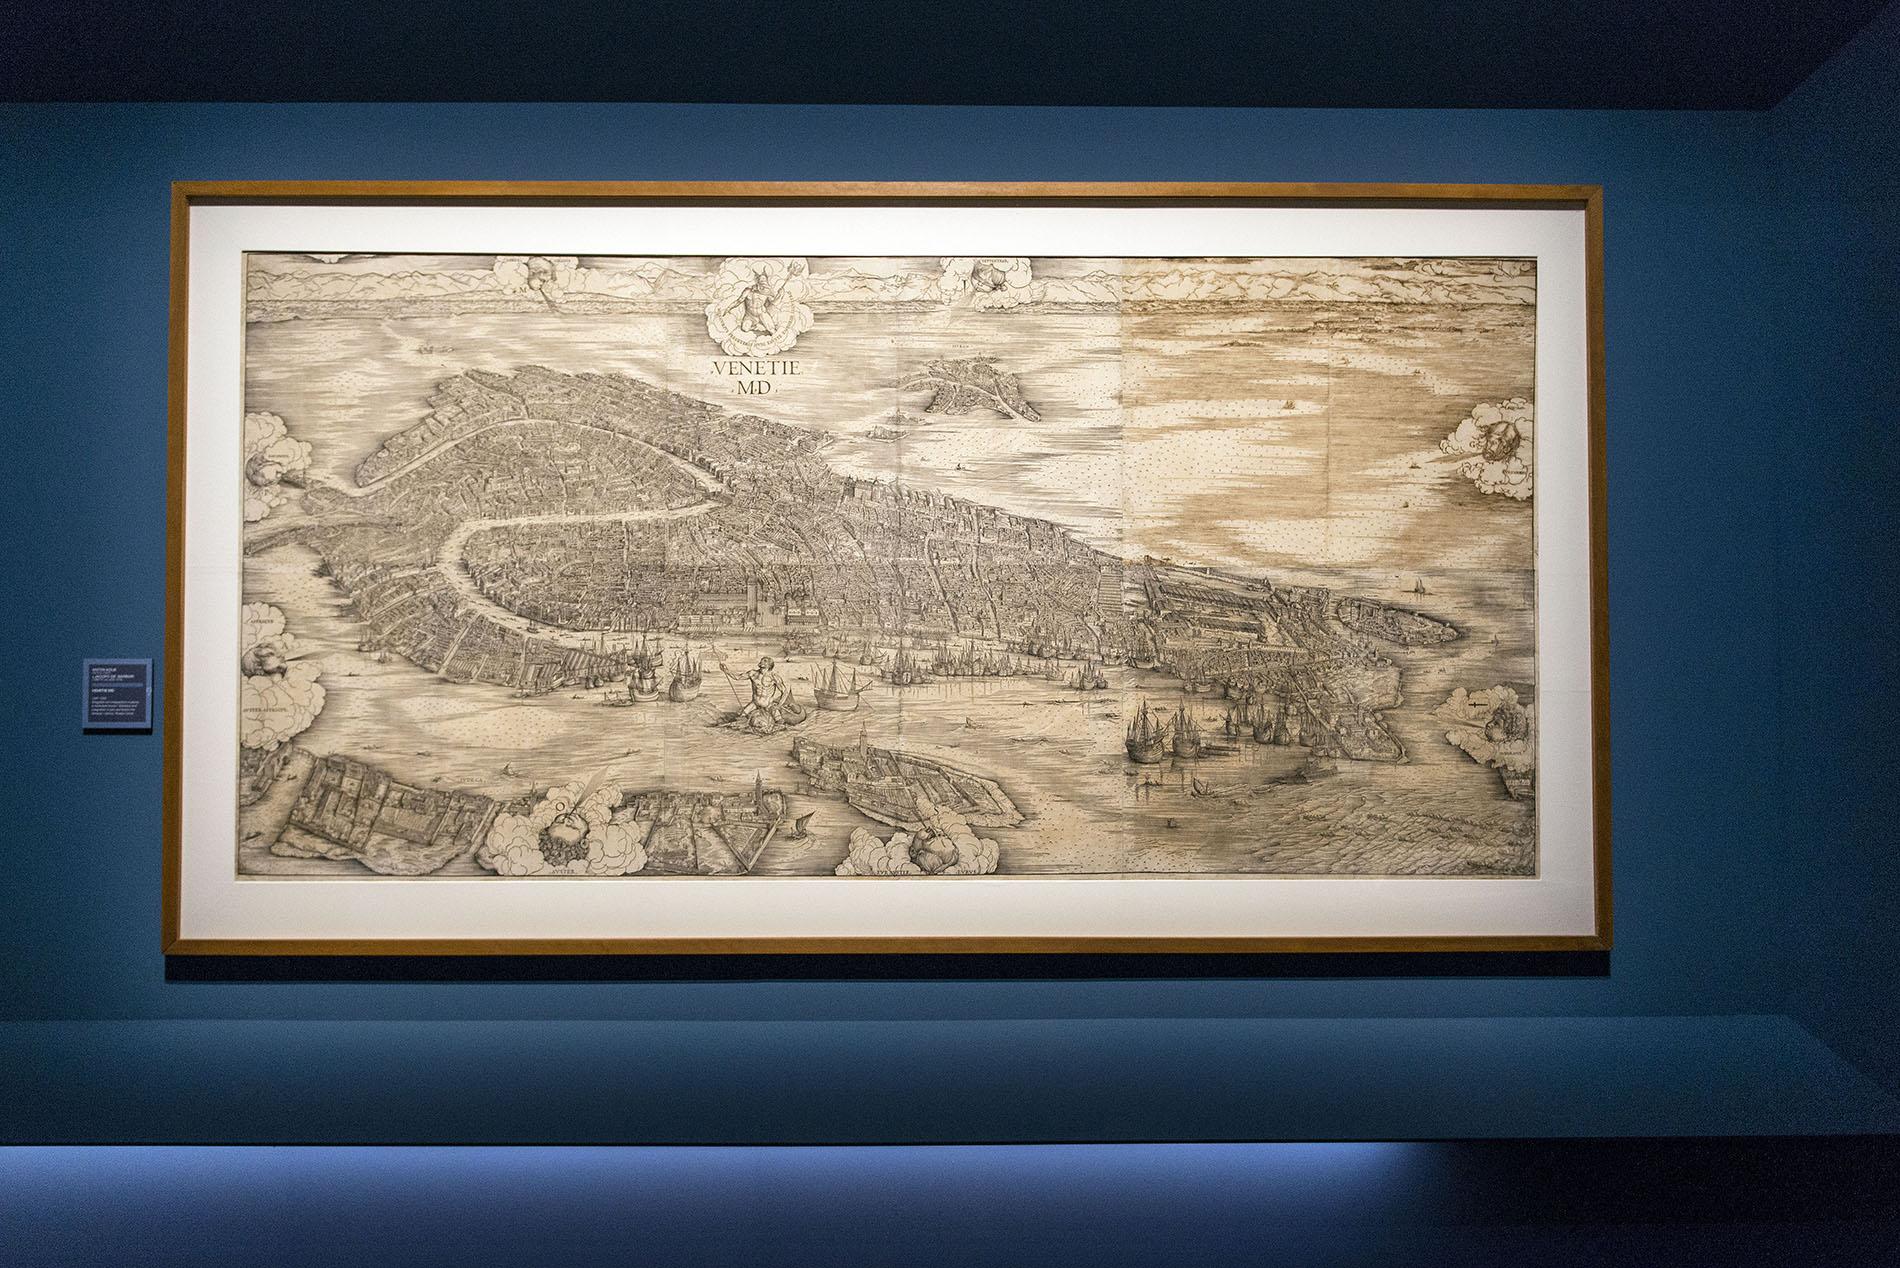 Ausstellungsansicht Palazzo Reale Milano, Jacopo de' Barbari, Veduta di Venezia, Radierung mehrteilig, Museo Correr Venezia, © Foto: Paolo Poce